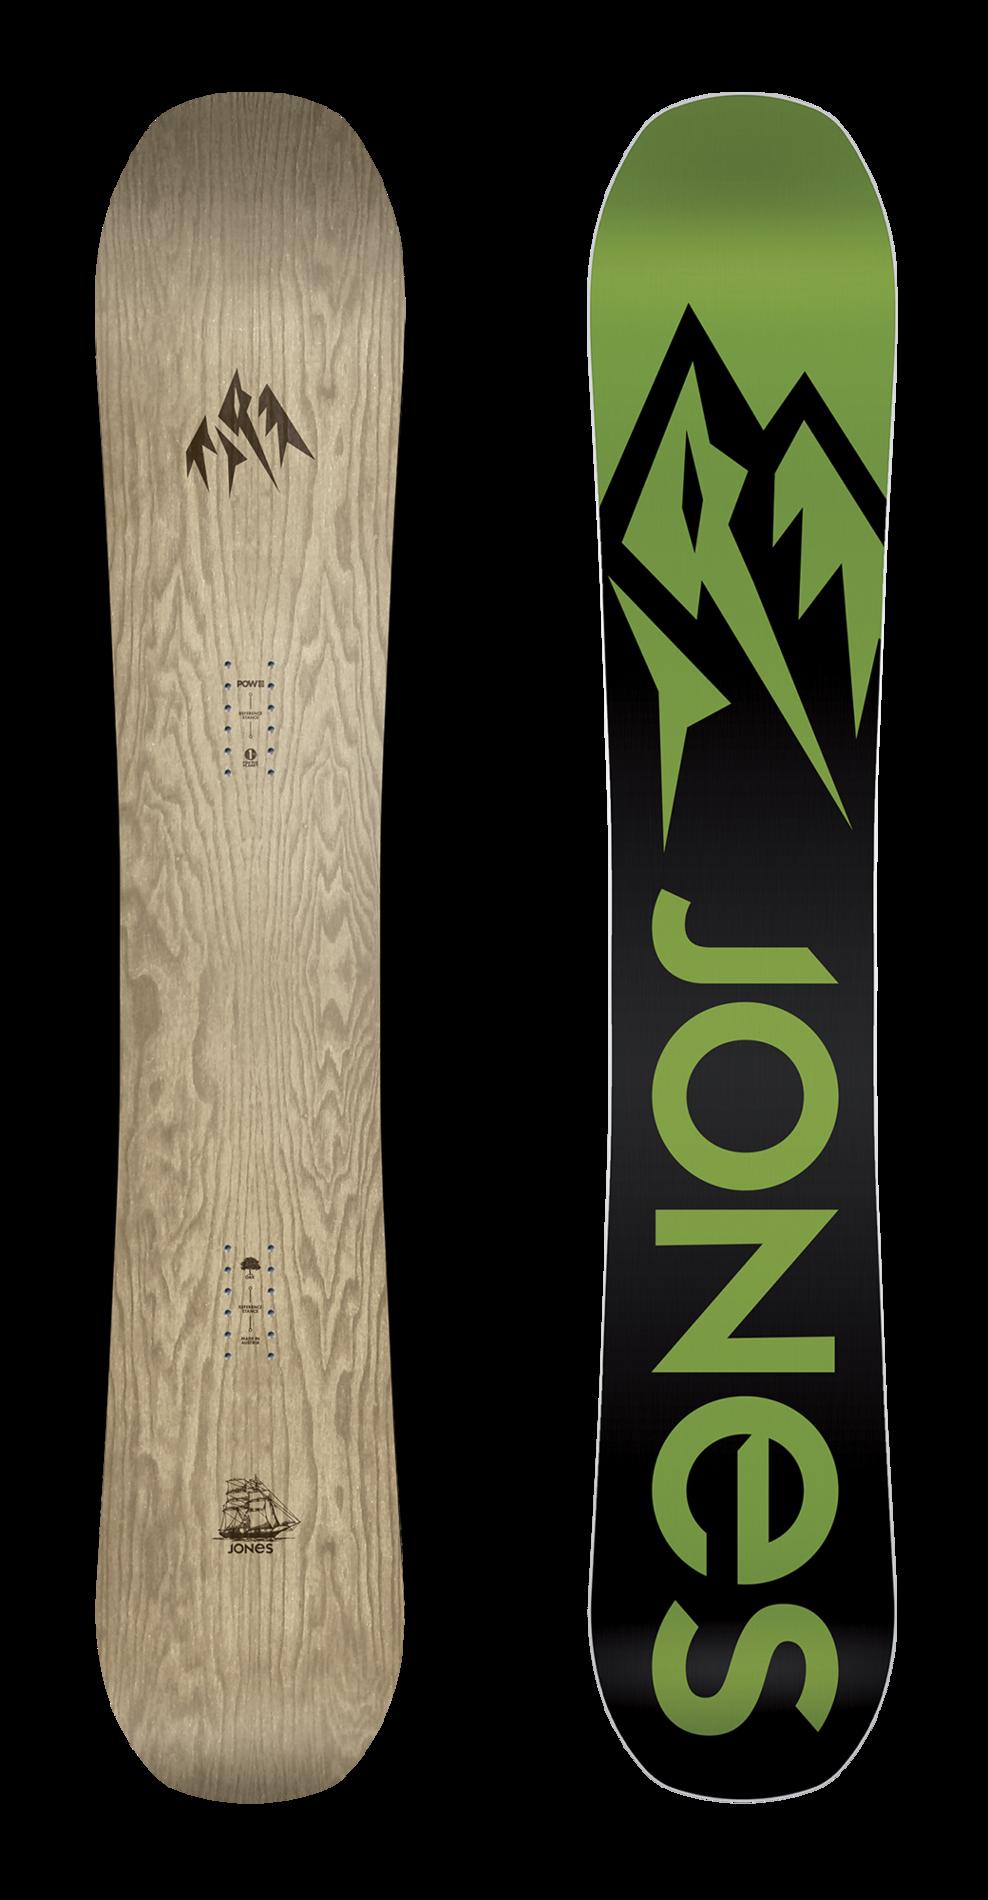 Jones Snowboards - The Journey Is The Reward - Flagship